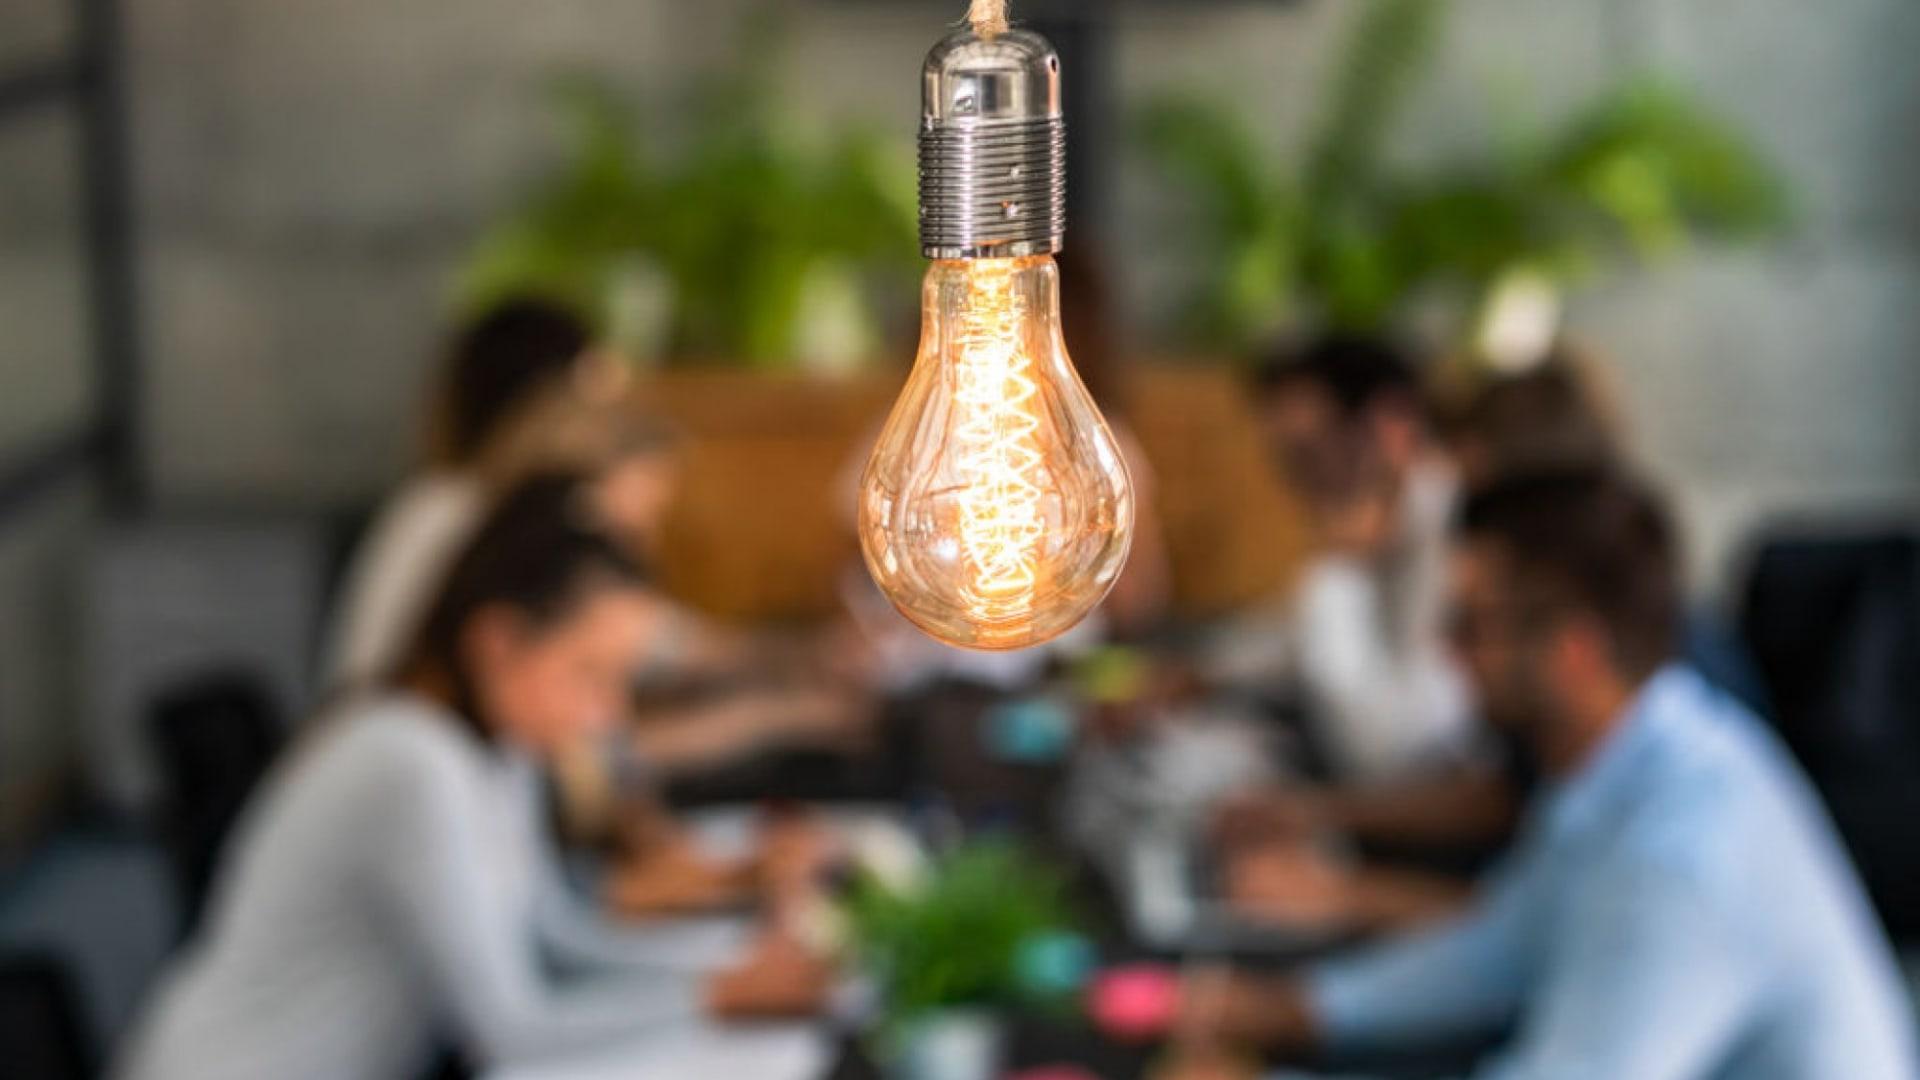 The often-overlooked key to startup success